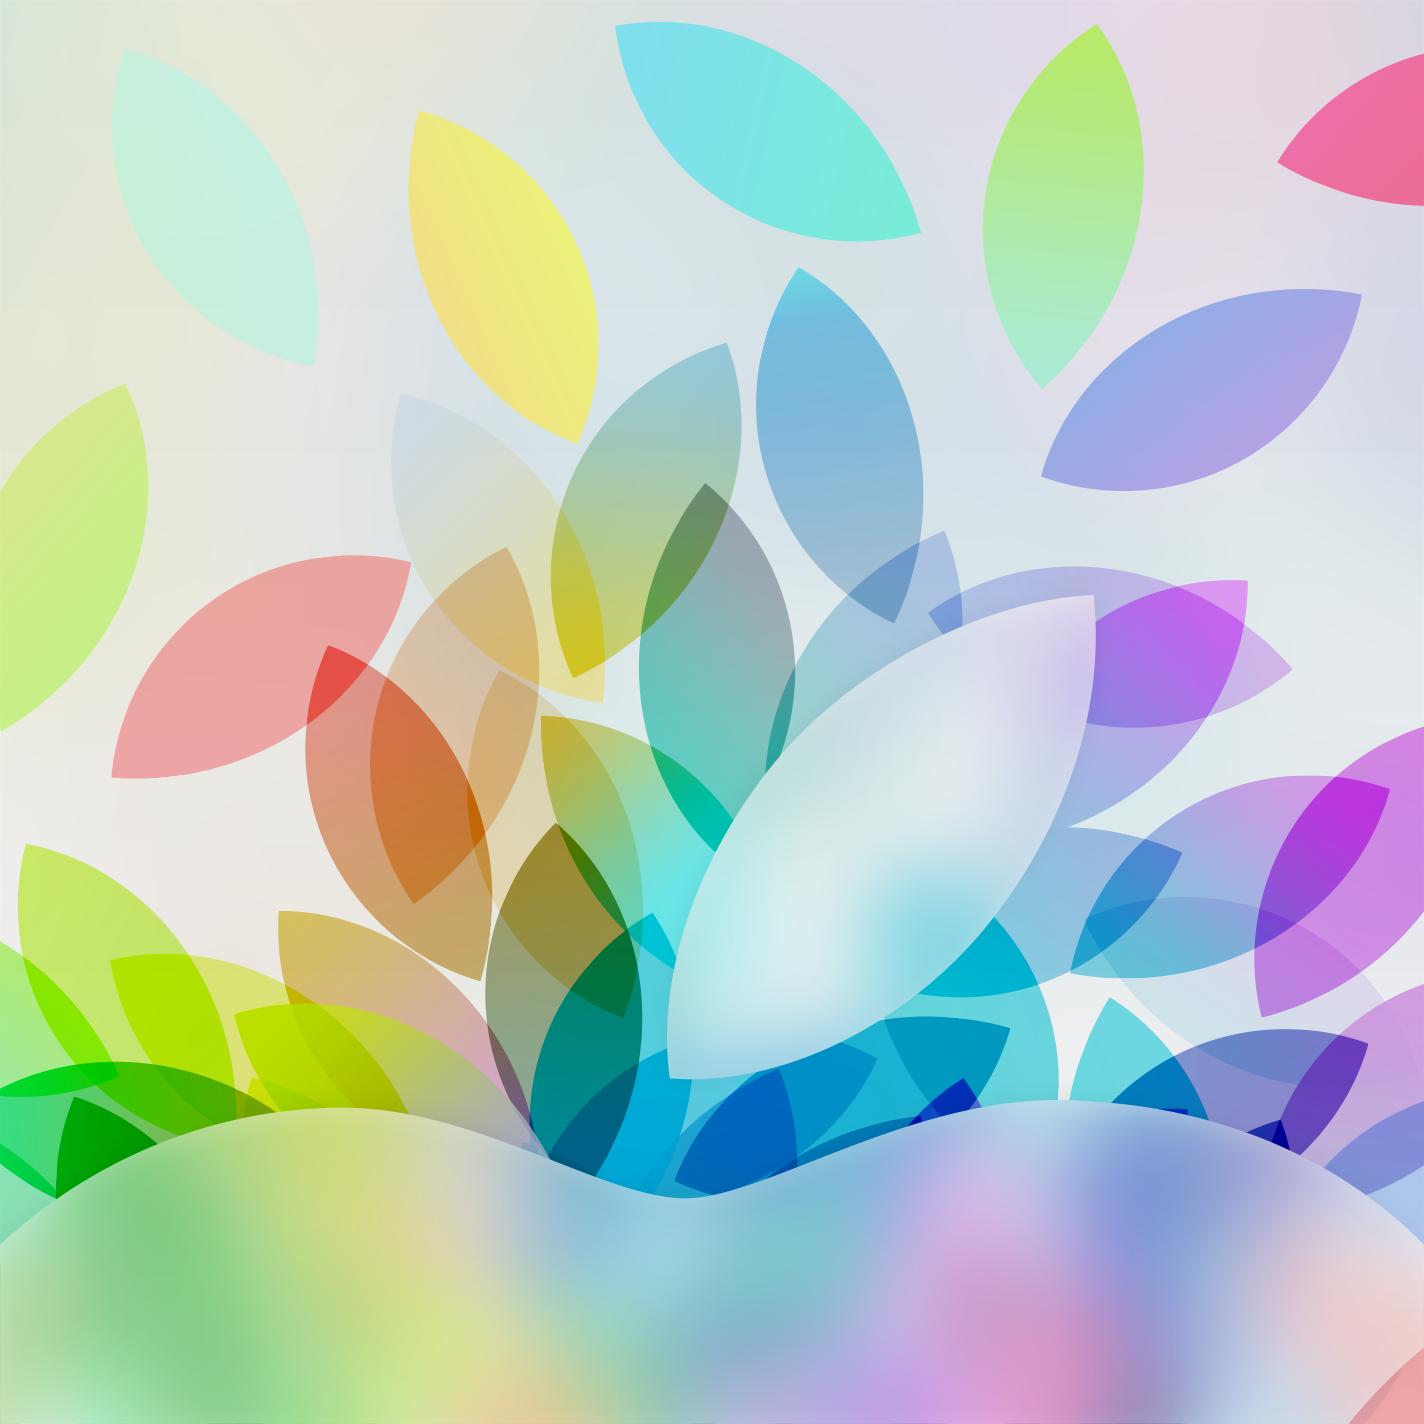 iphone libre 4 s